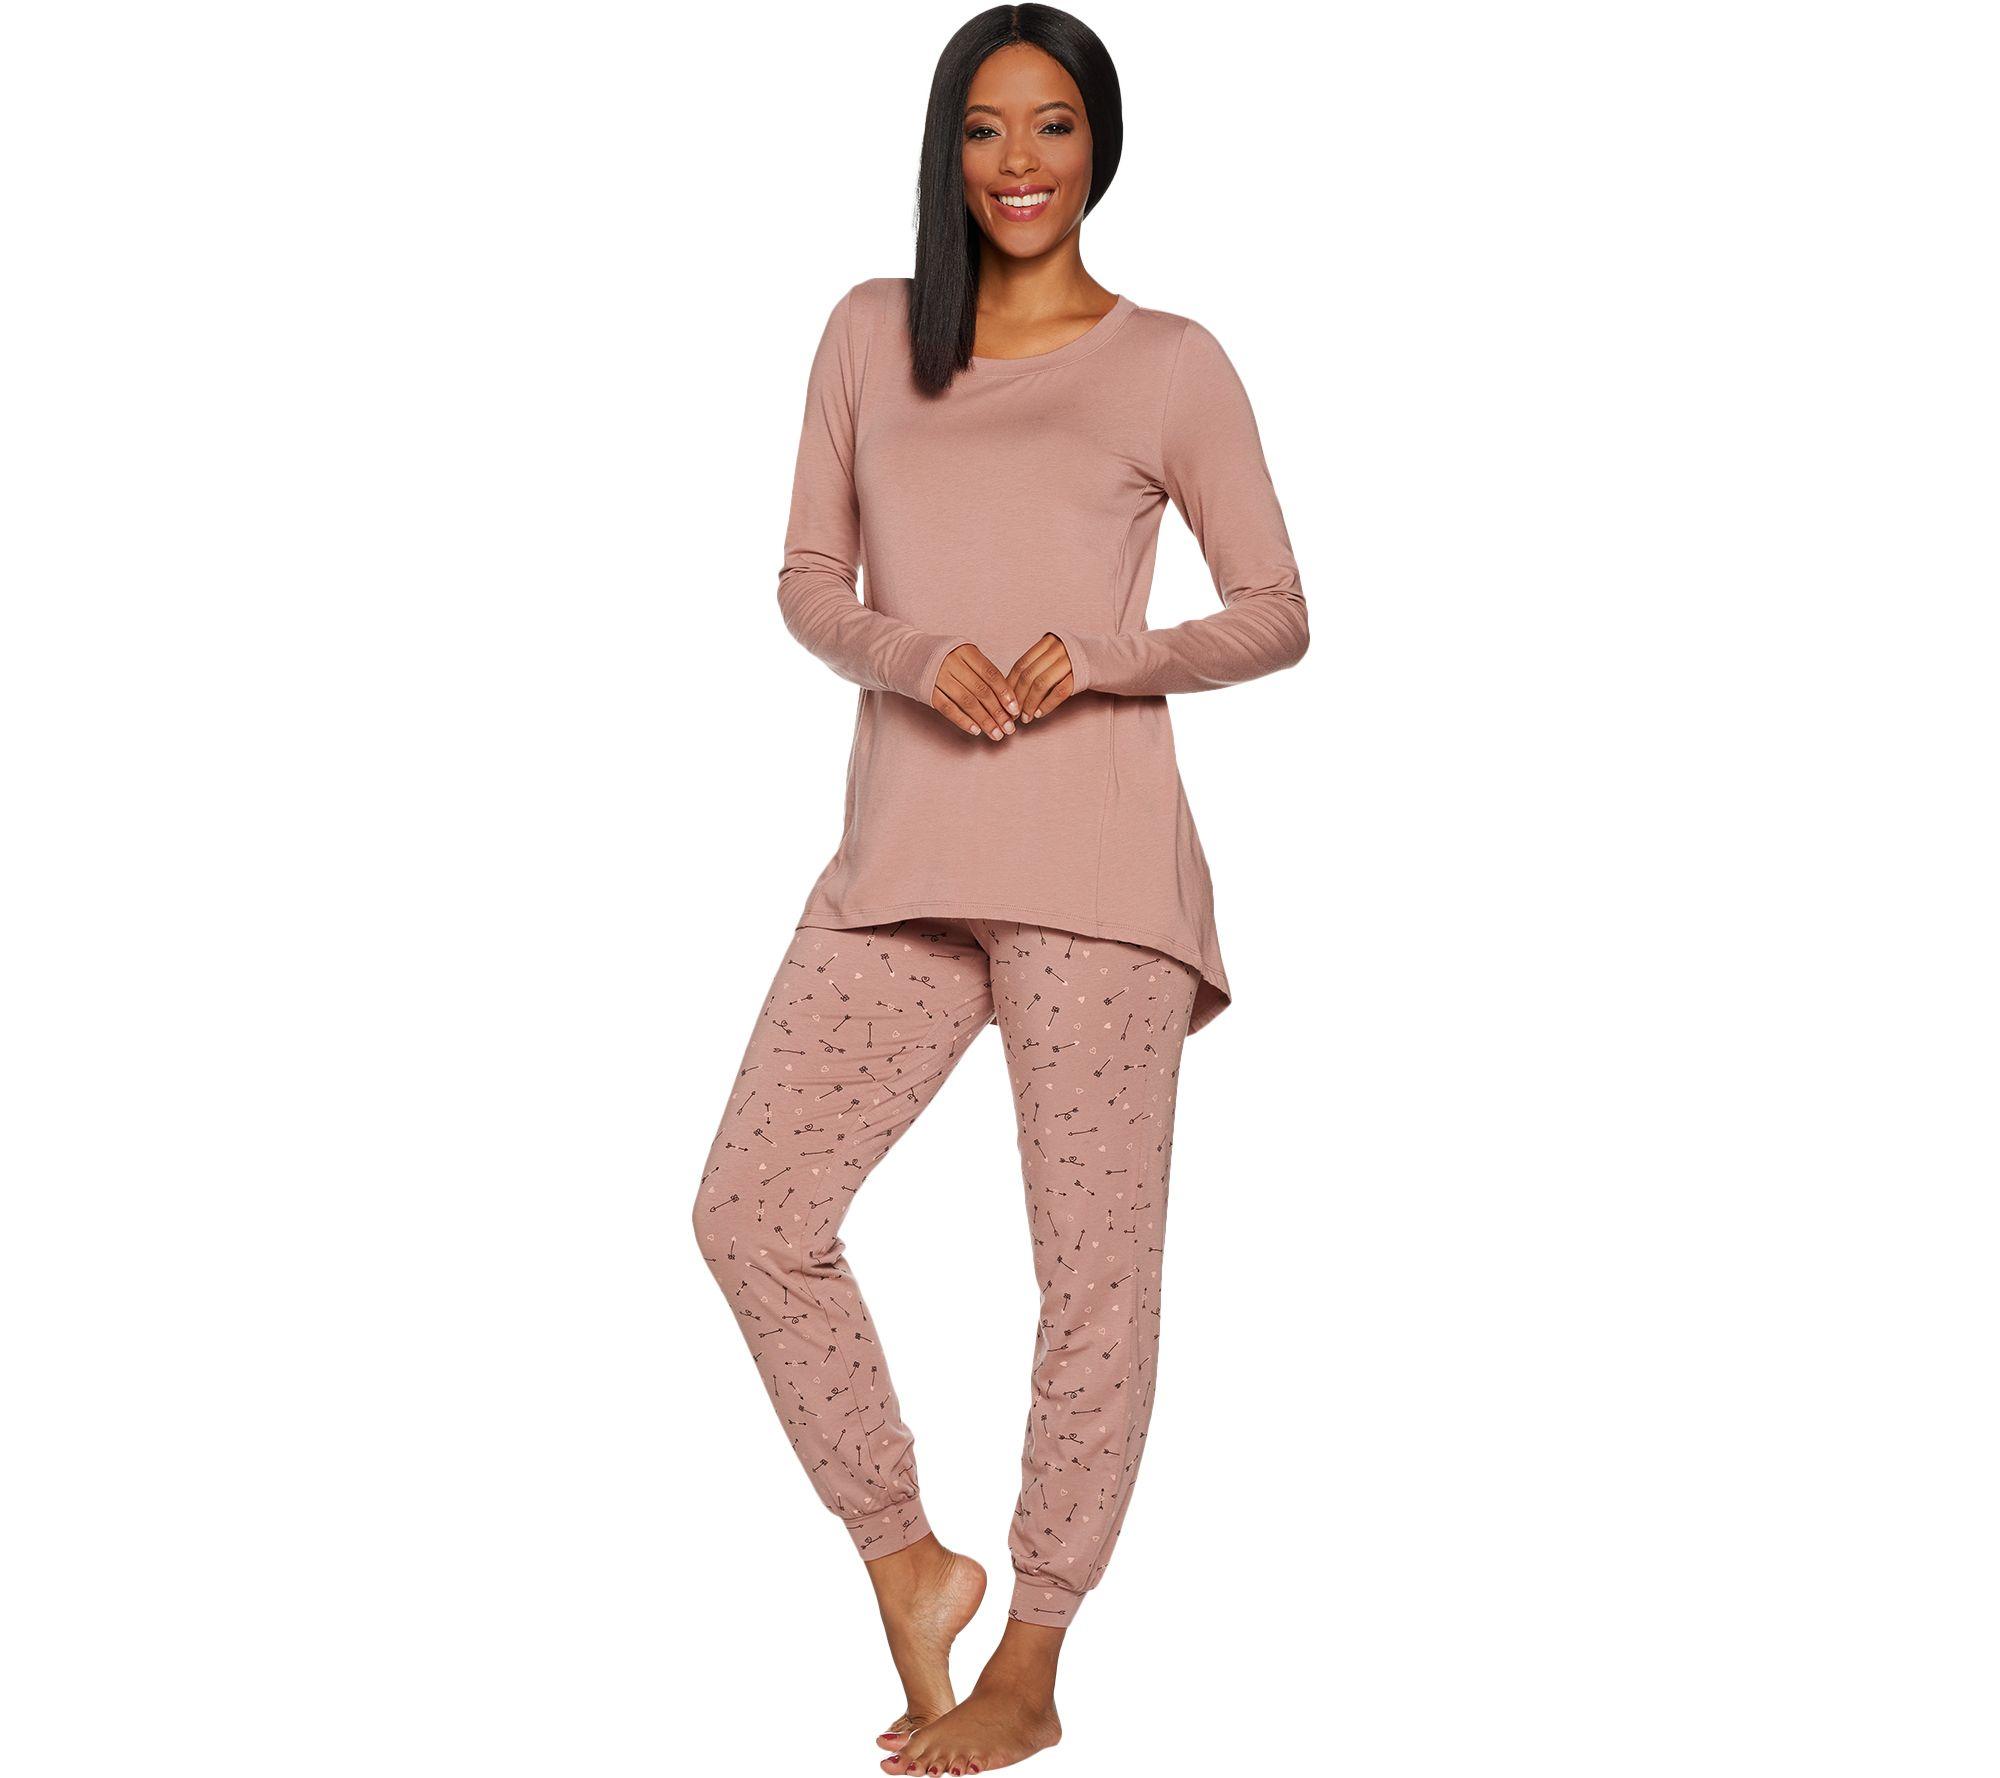 0e689e06aa AnyBody Loungewear Petite Cozy Knit Novelty Print PJ Set - Page 1 ...